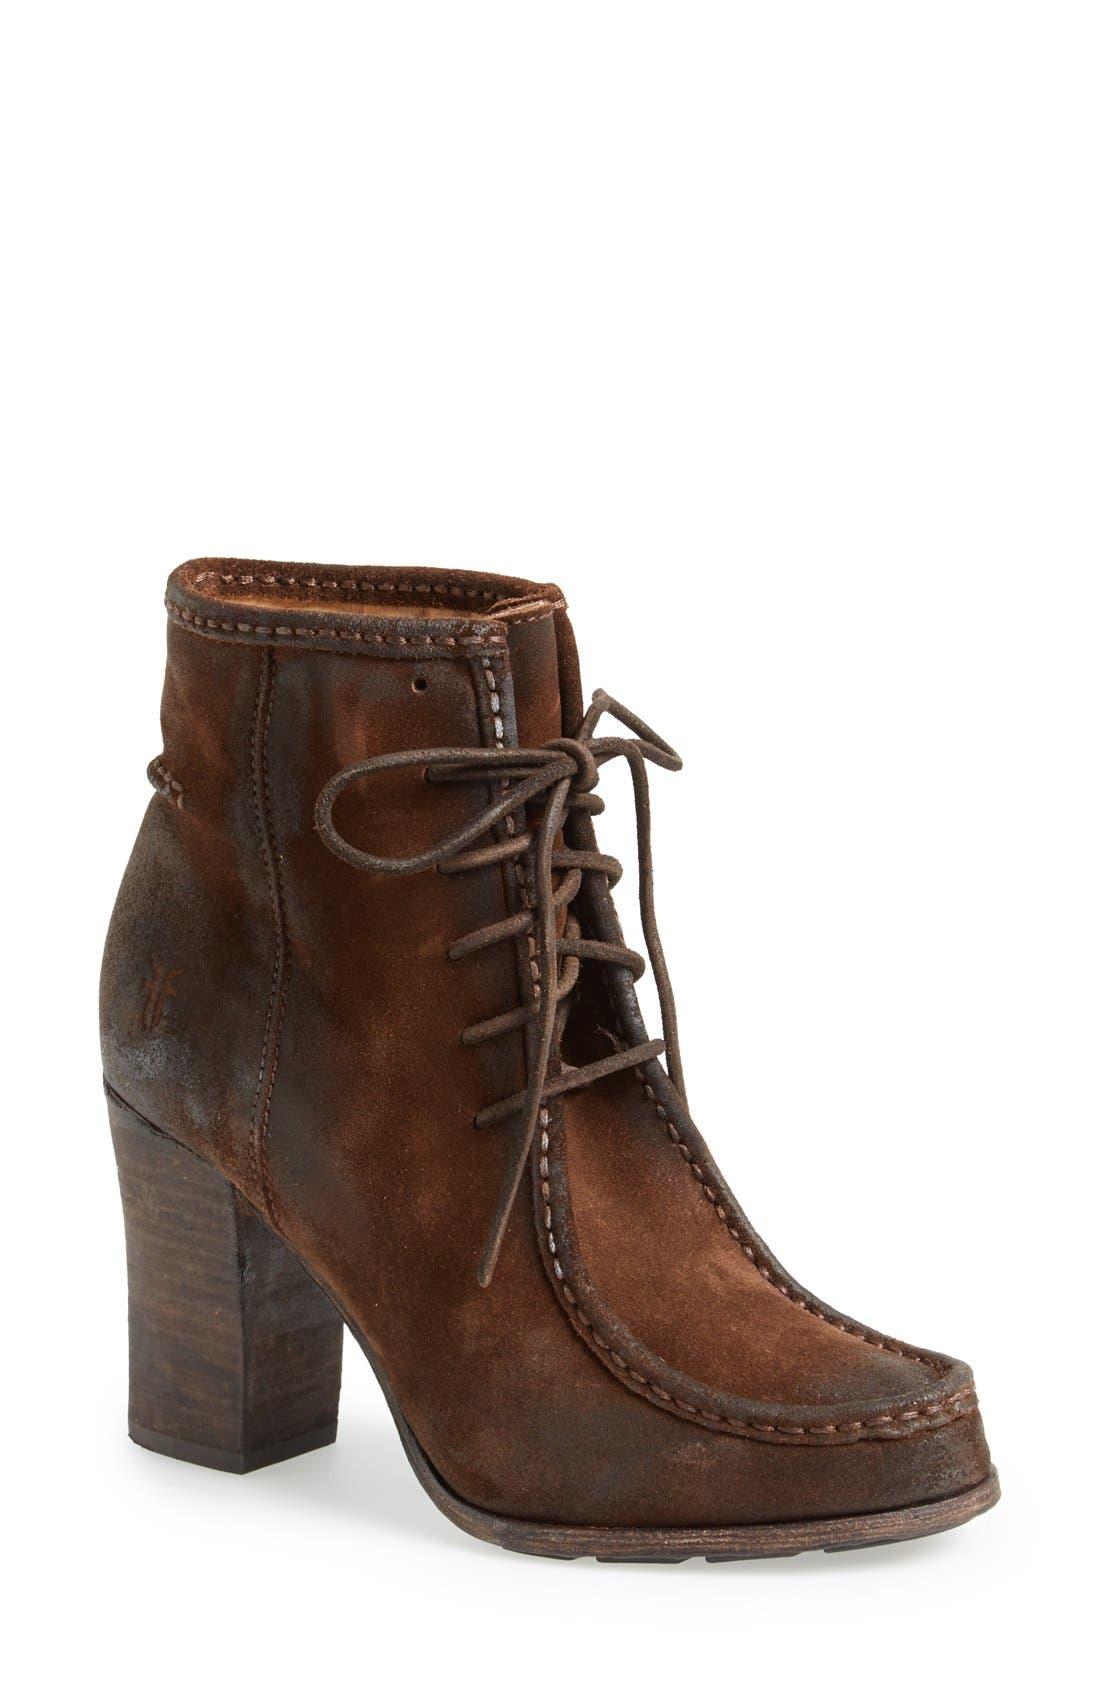 Alternate Image 1 Selected - Frye 'Parker' Suede Moc Toe Ankle Boot (Women)